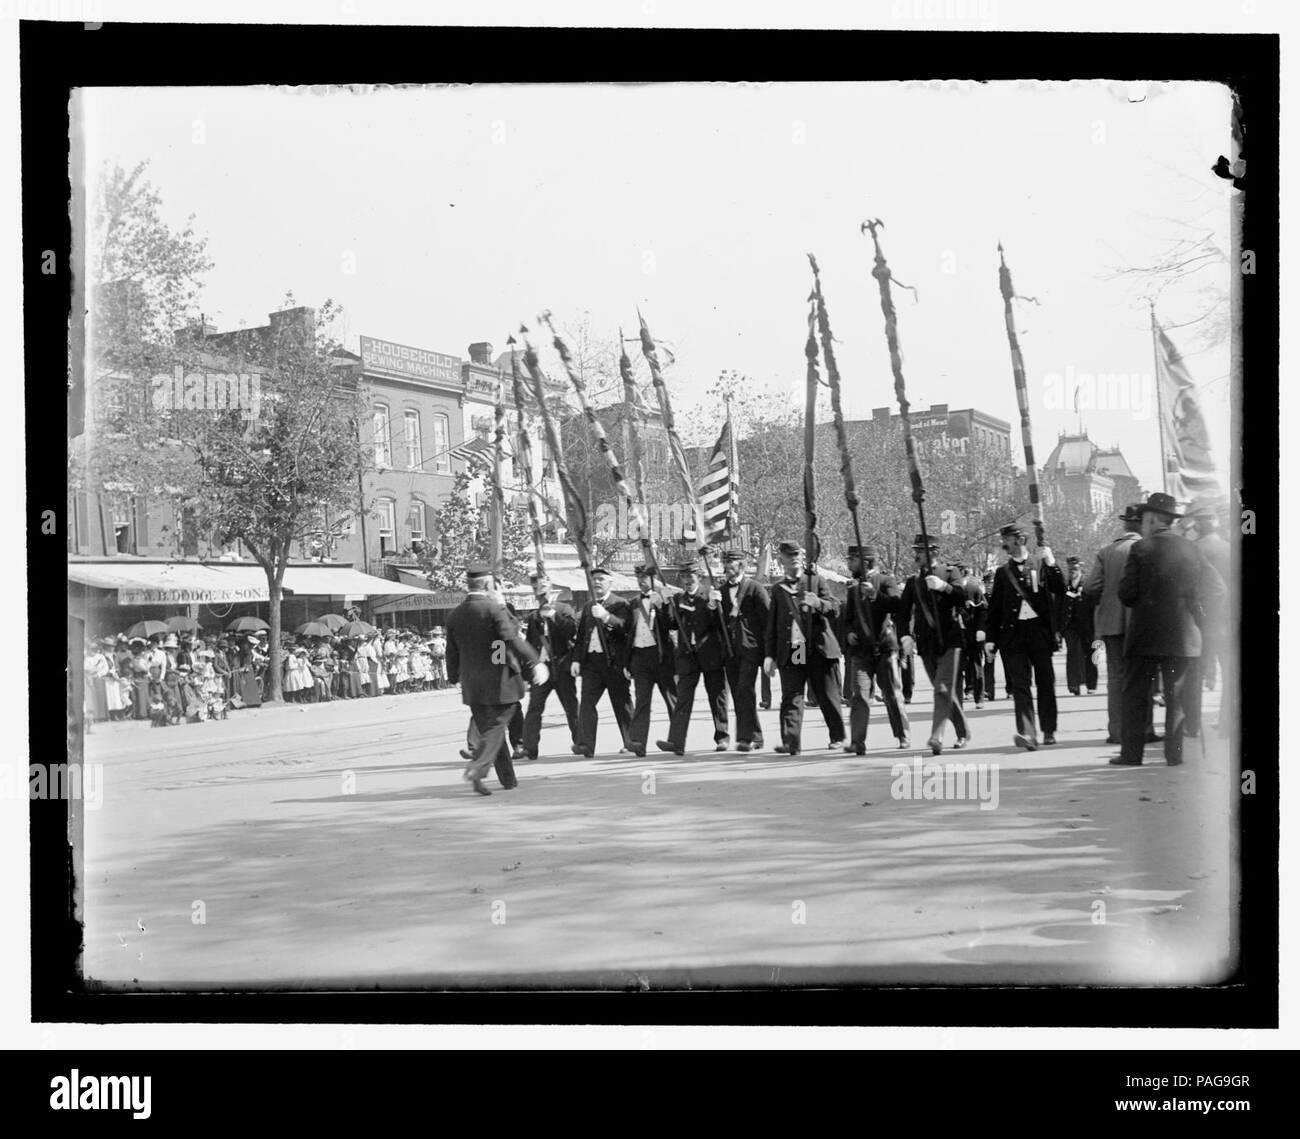 Battle Of Trenton Black and White Stock Photos & Images - Alamy